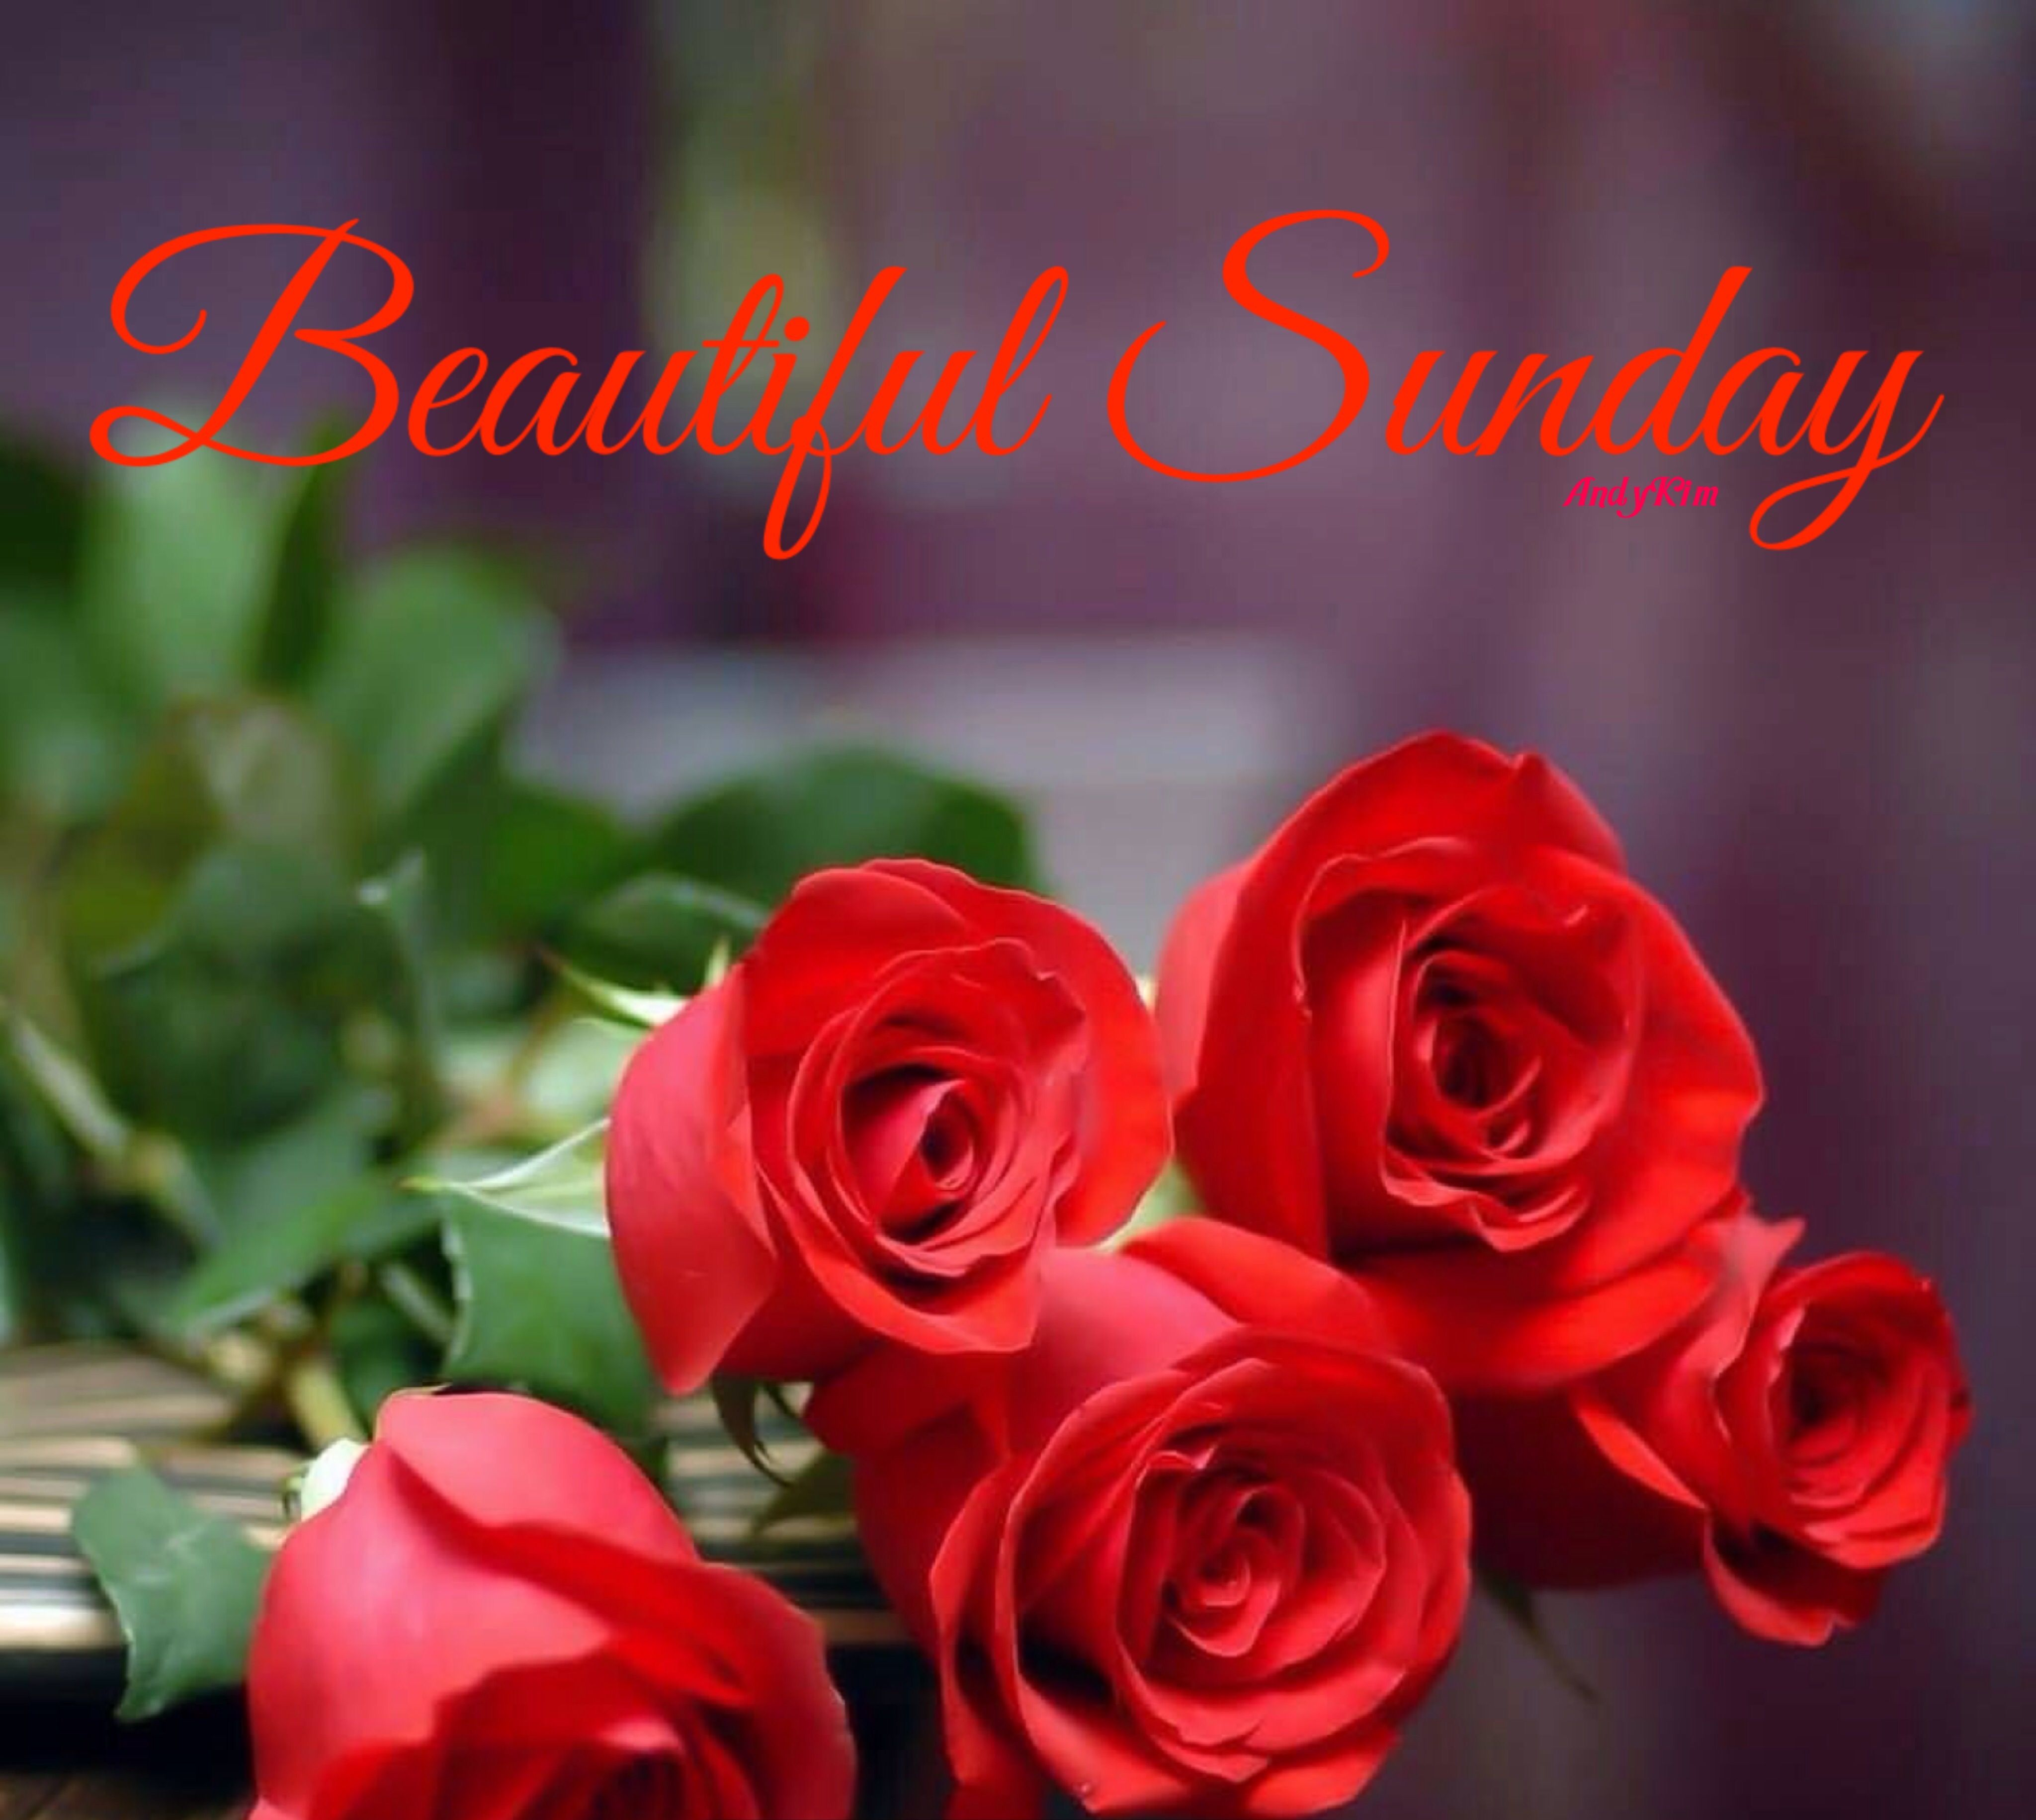 Good Morning วันอาทิตย์, สติกเกอร์, ดอกไม้